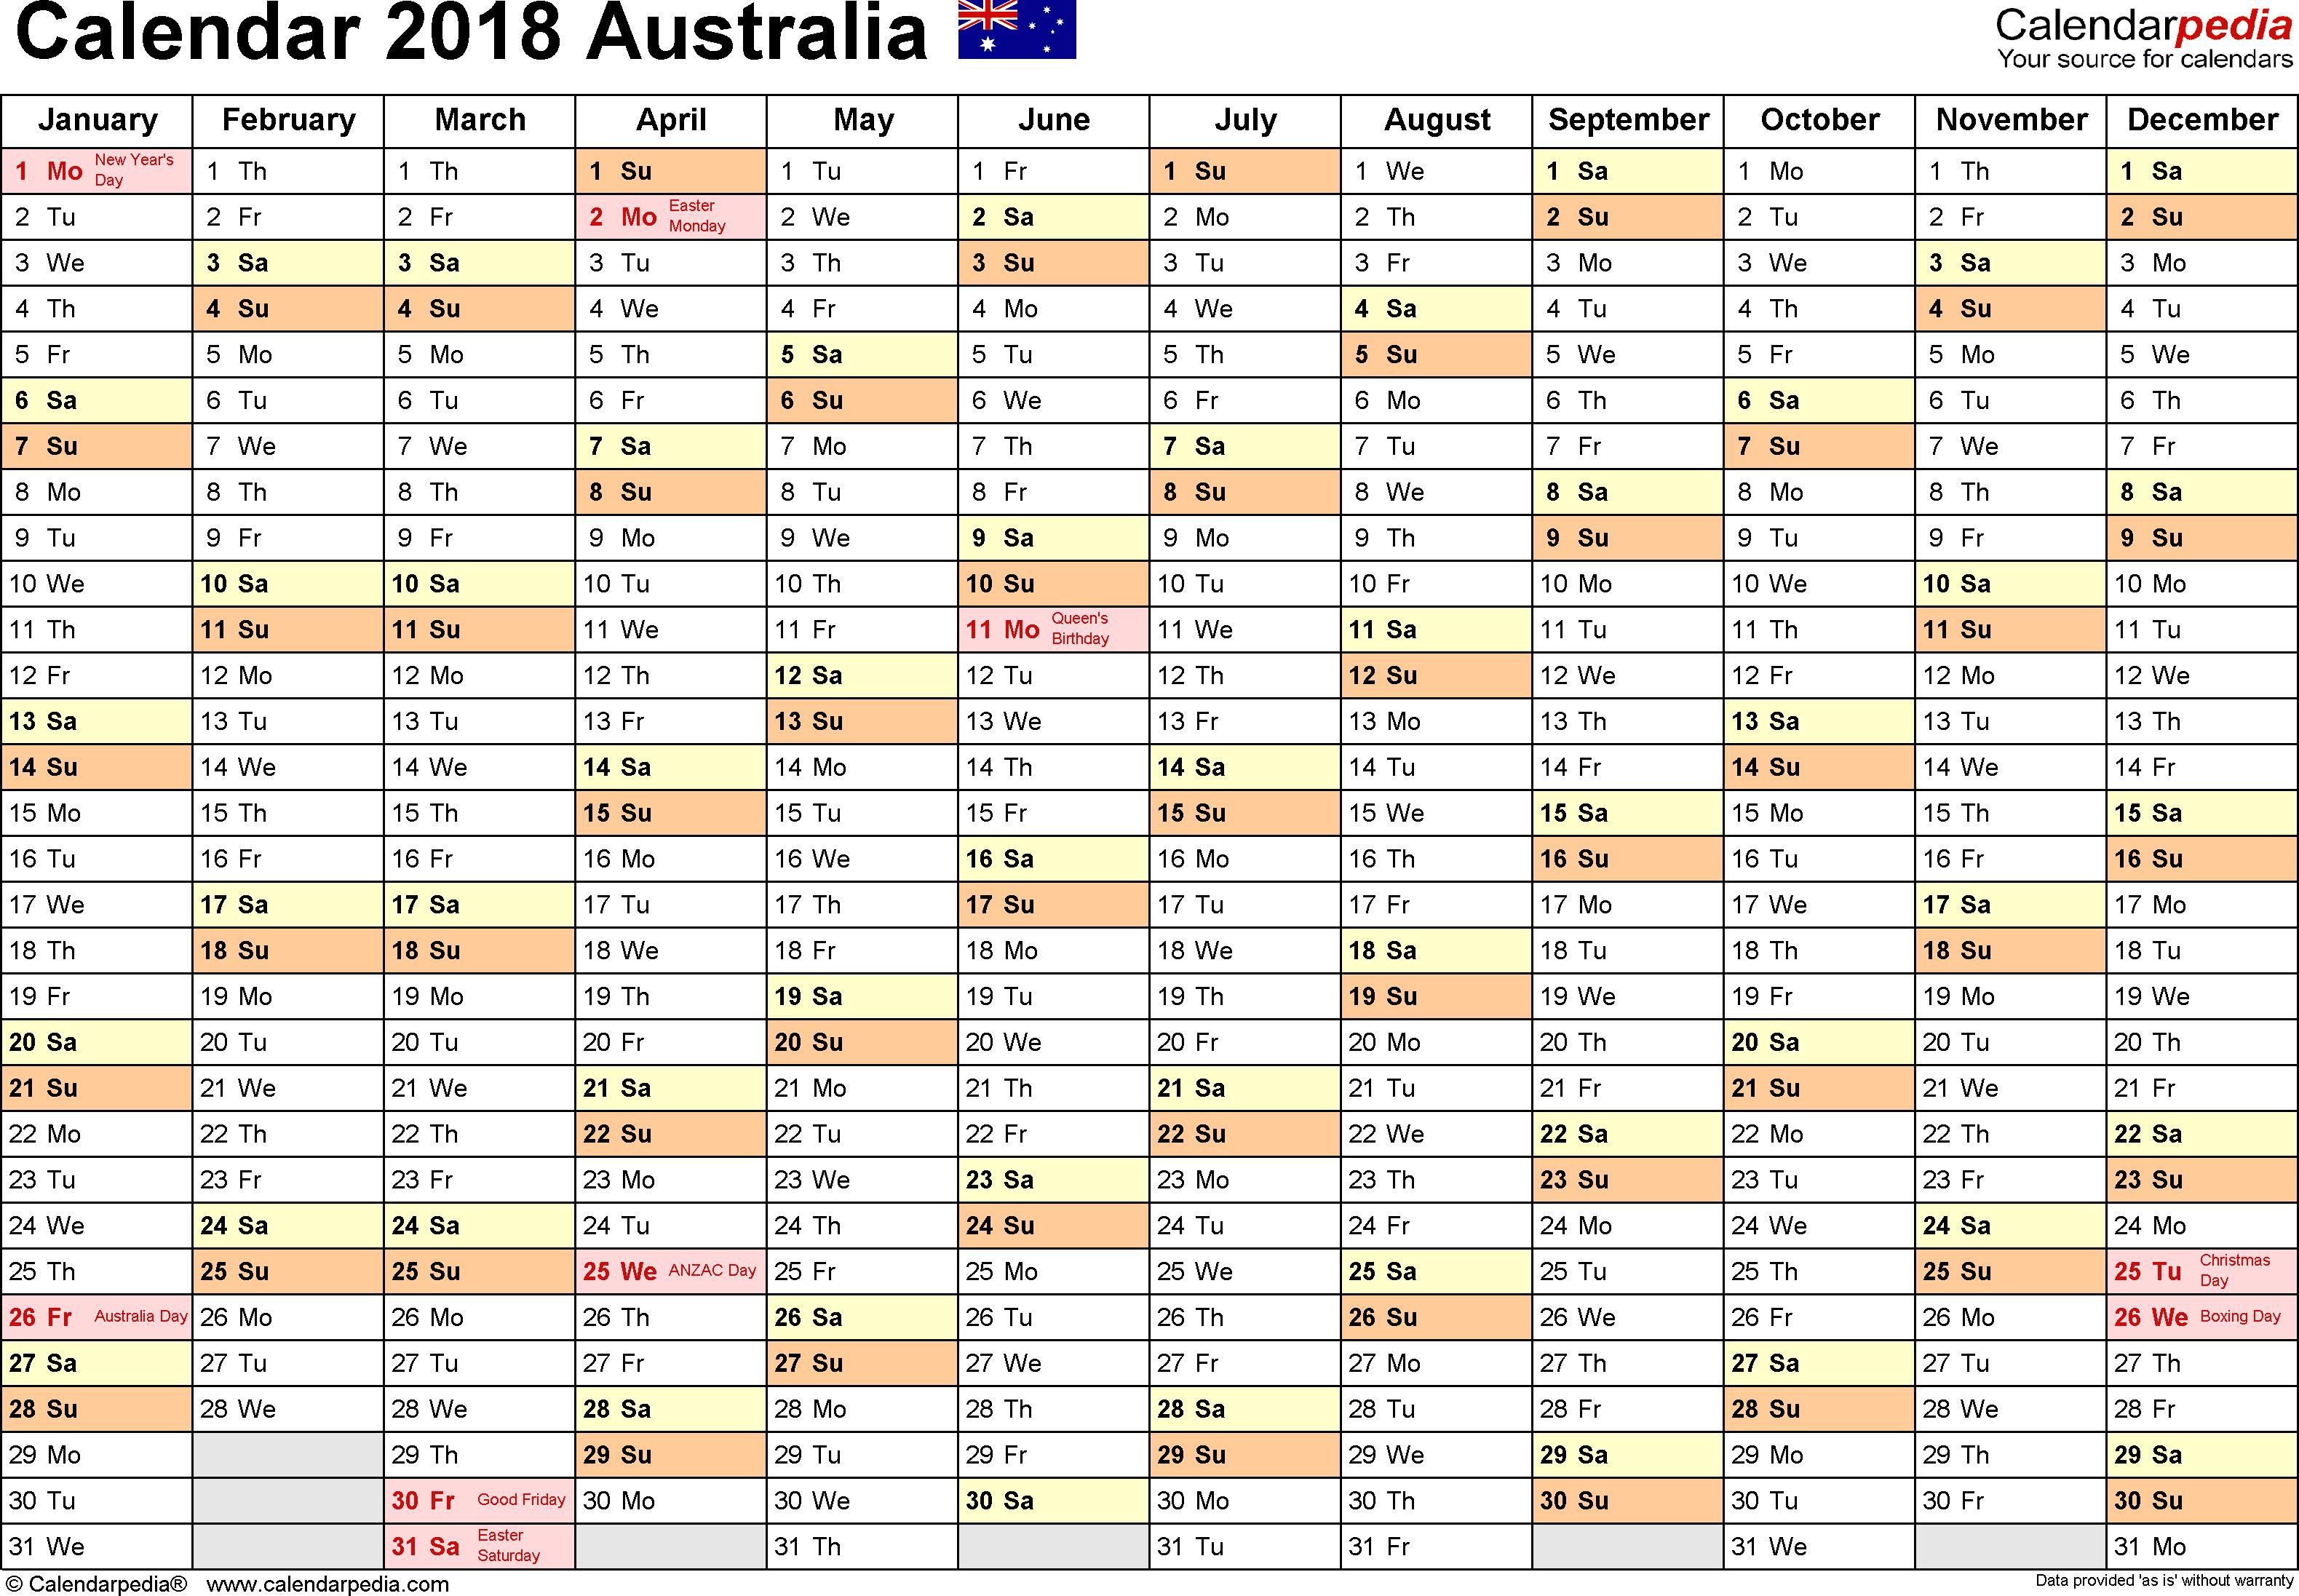 Australia Calendar 2018 - Free Printable Excel Templates